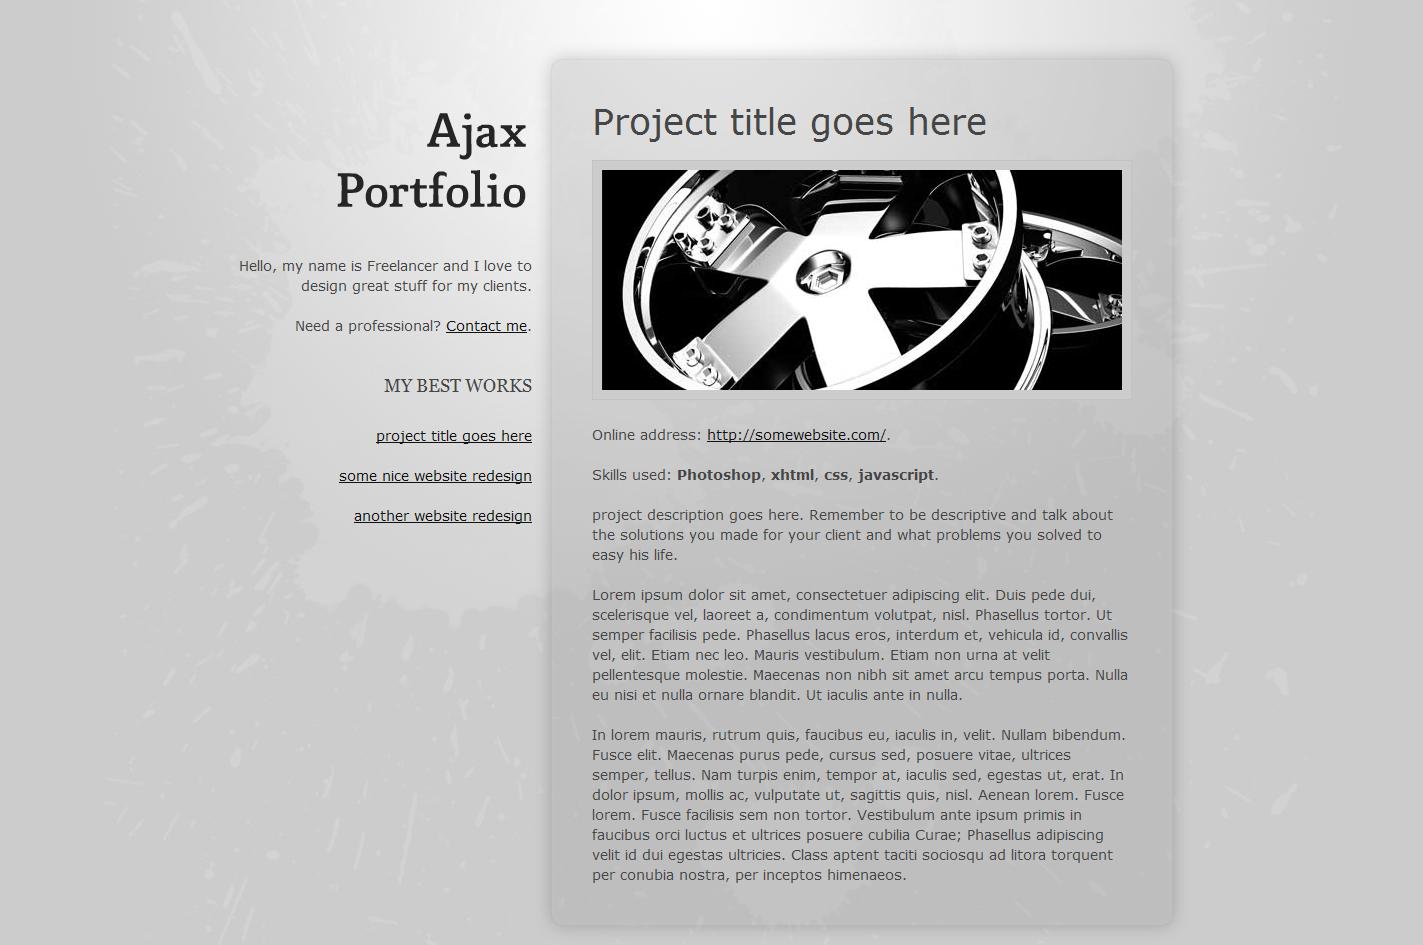 Ajax Portfolio